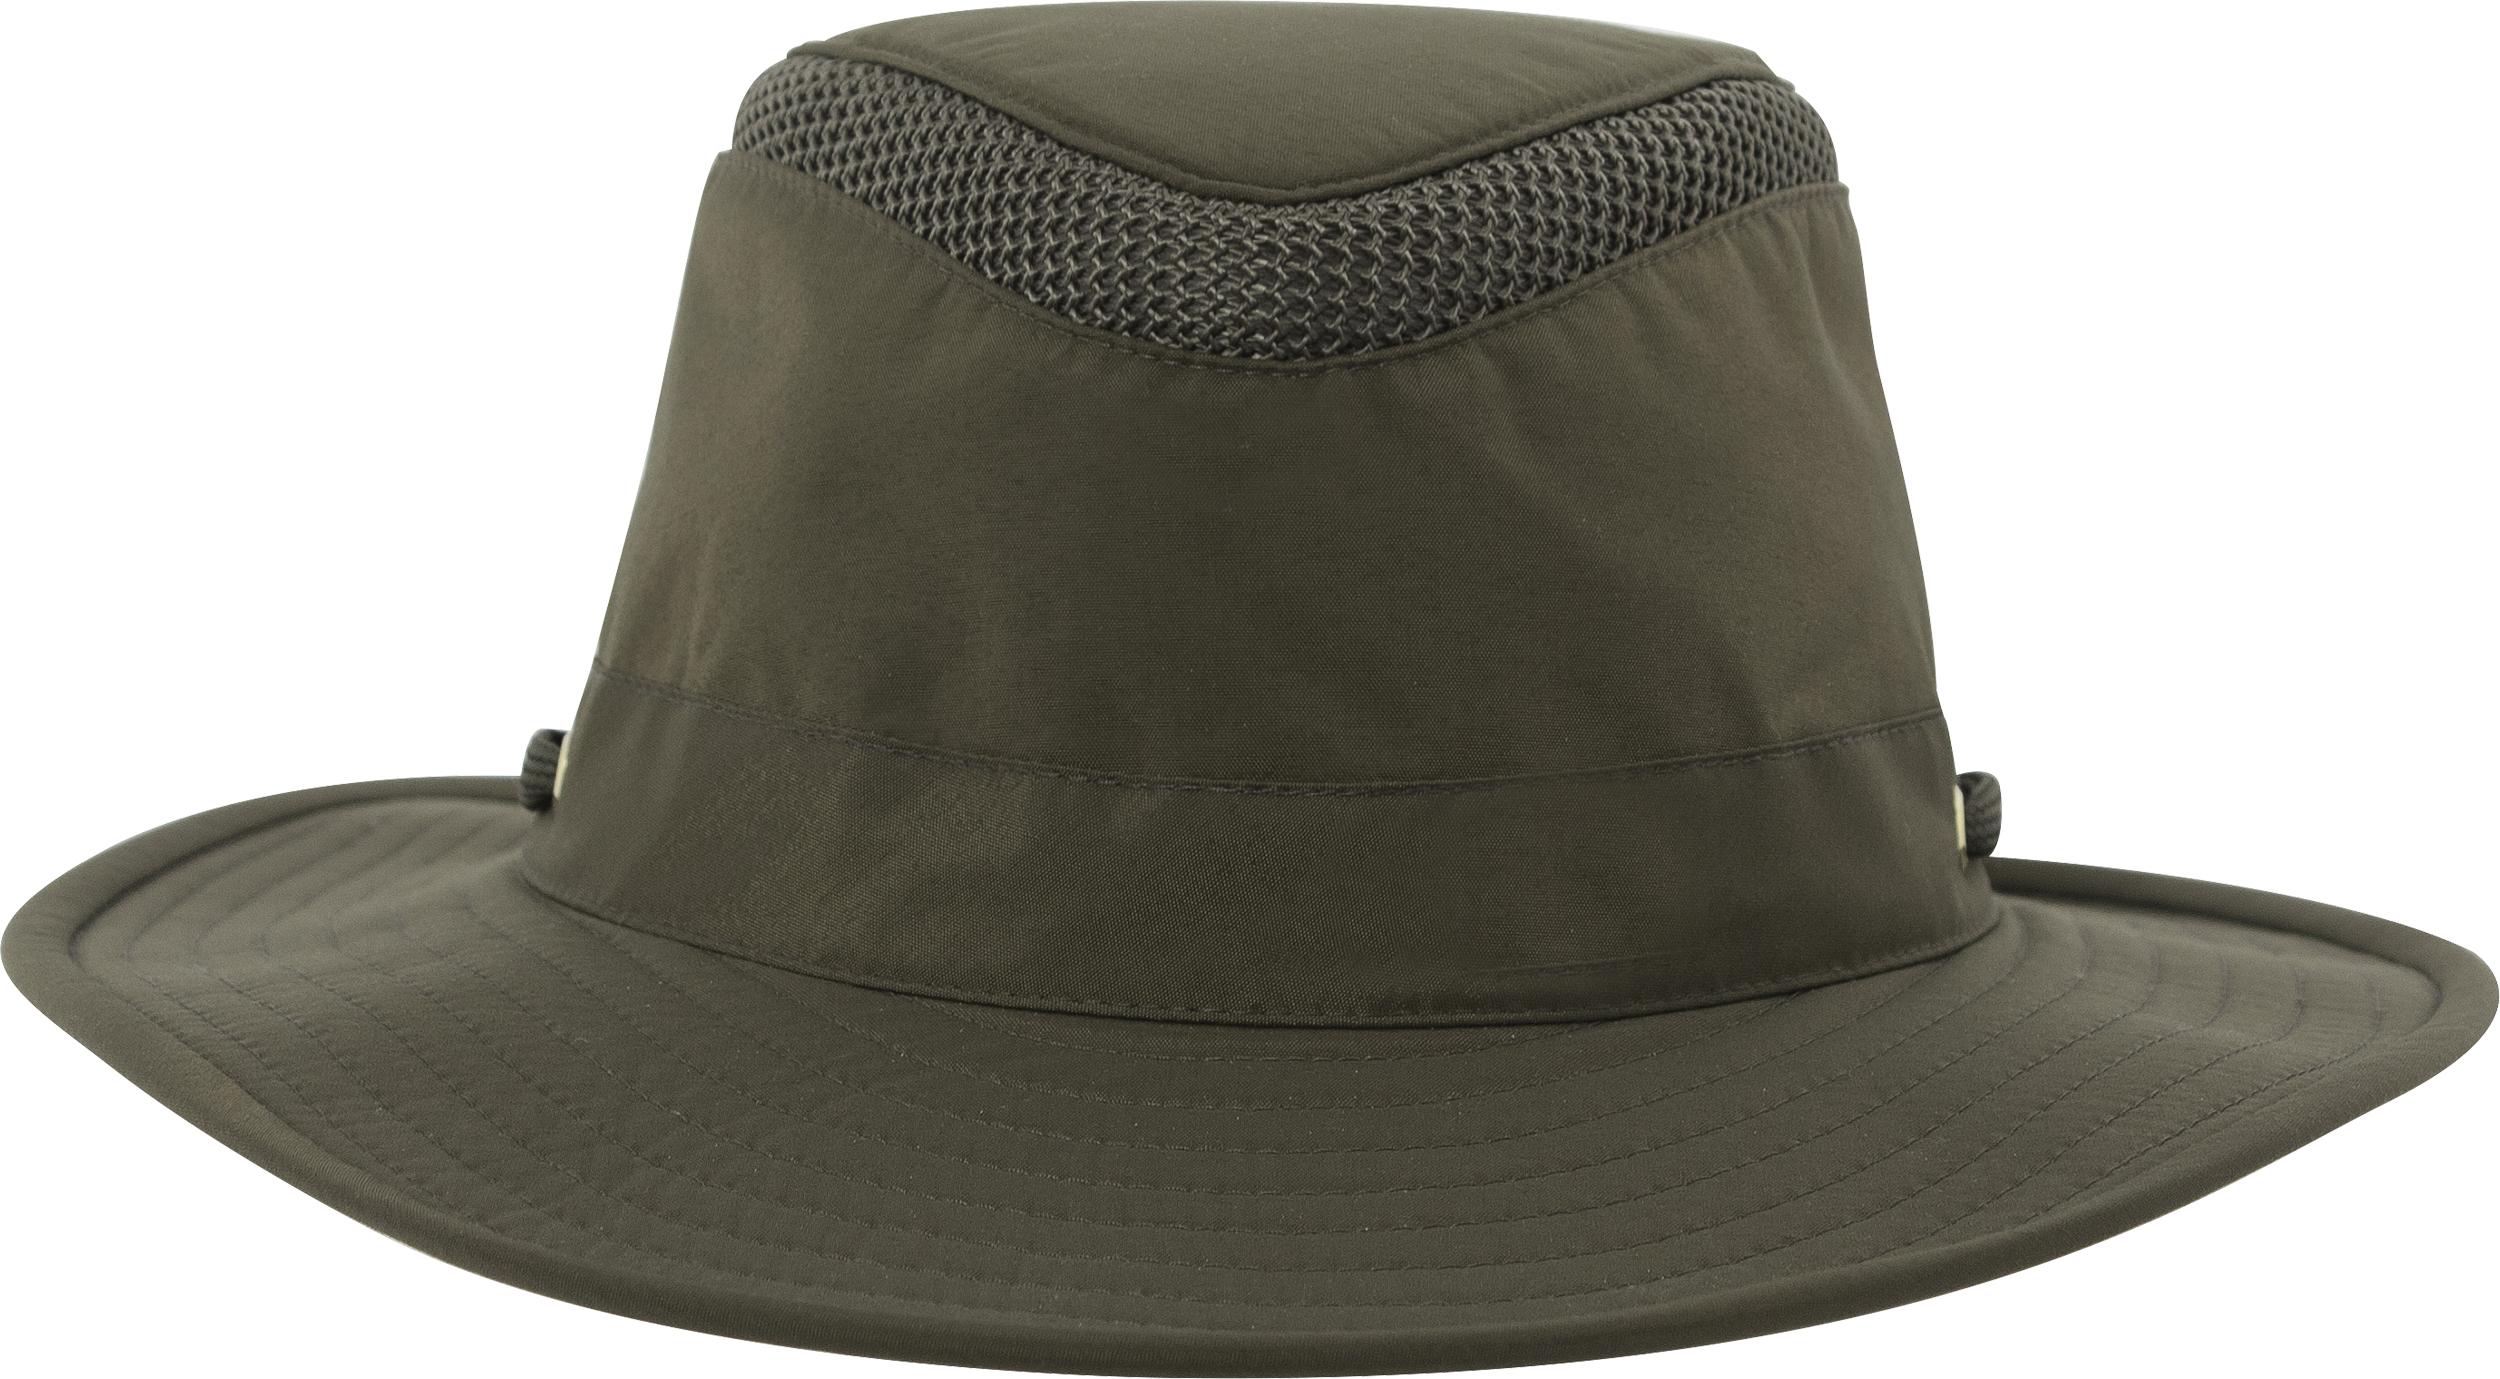 191addd2f7349 Tilley Endurables LTM6 Airflo Hat - Unisex